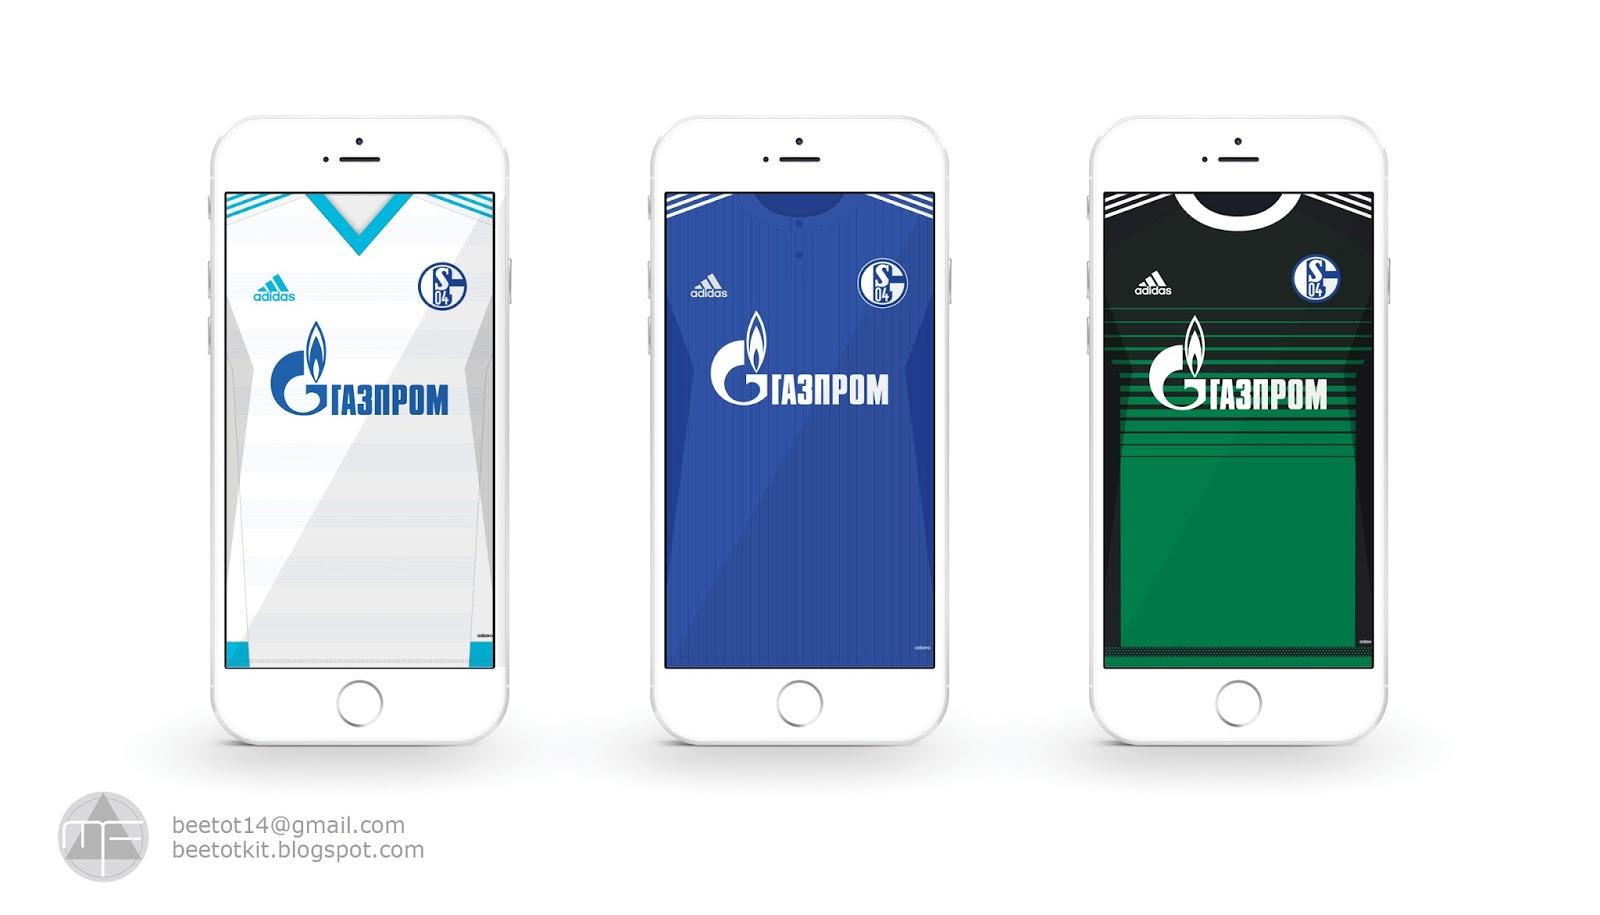 Beetot Kit: Schalke 04 Kit 15/16 Iphone 6 Wallpaper